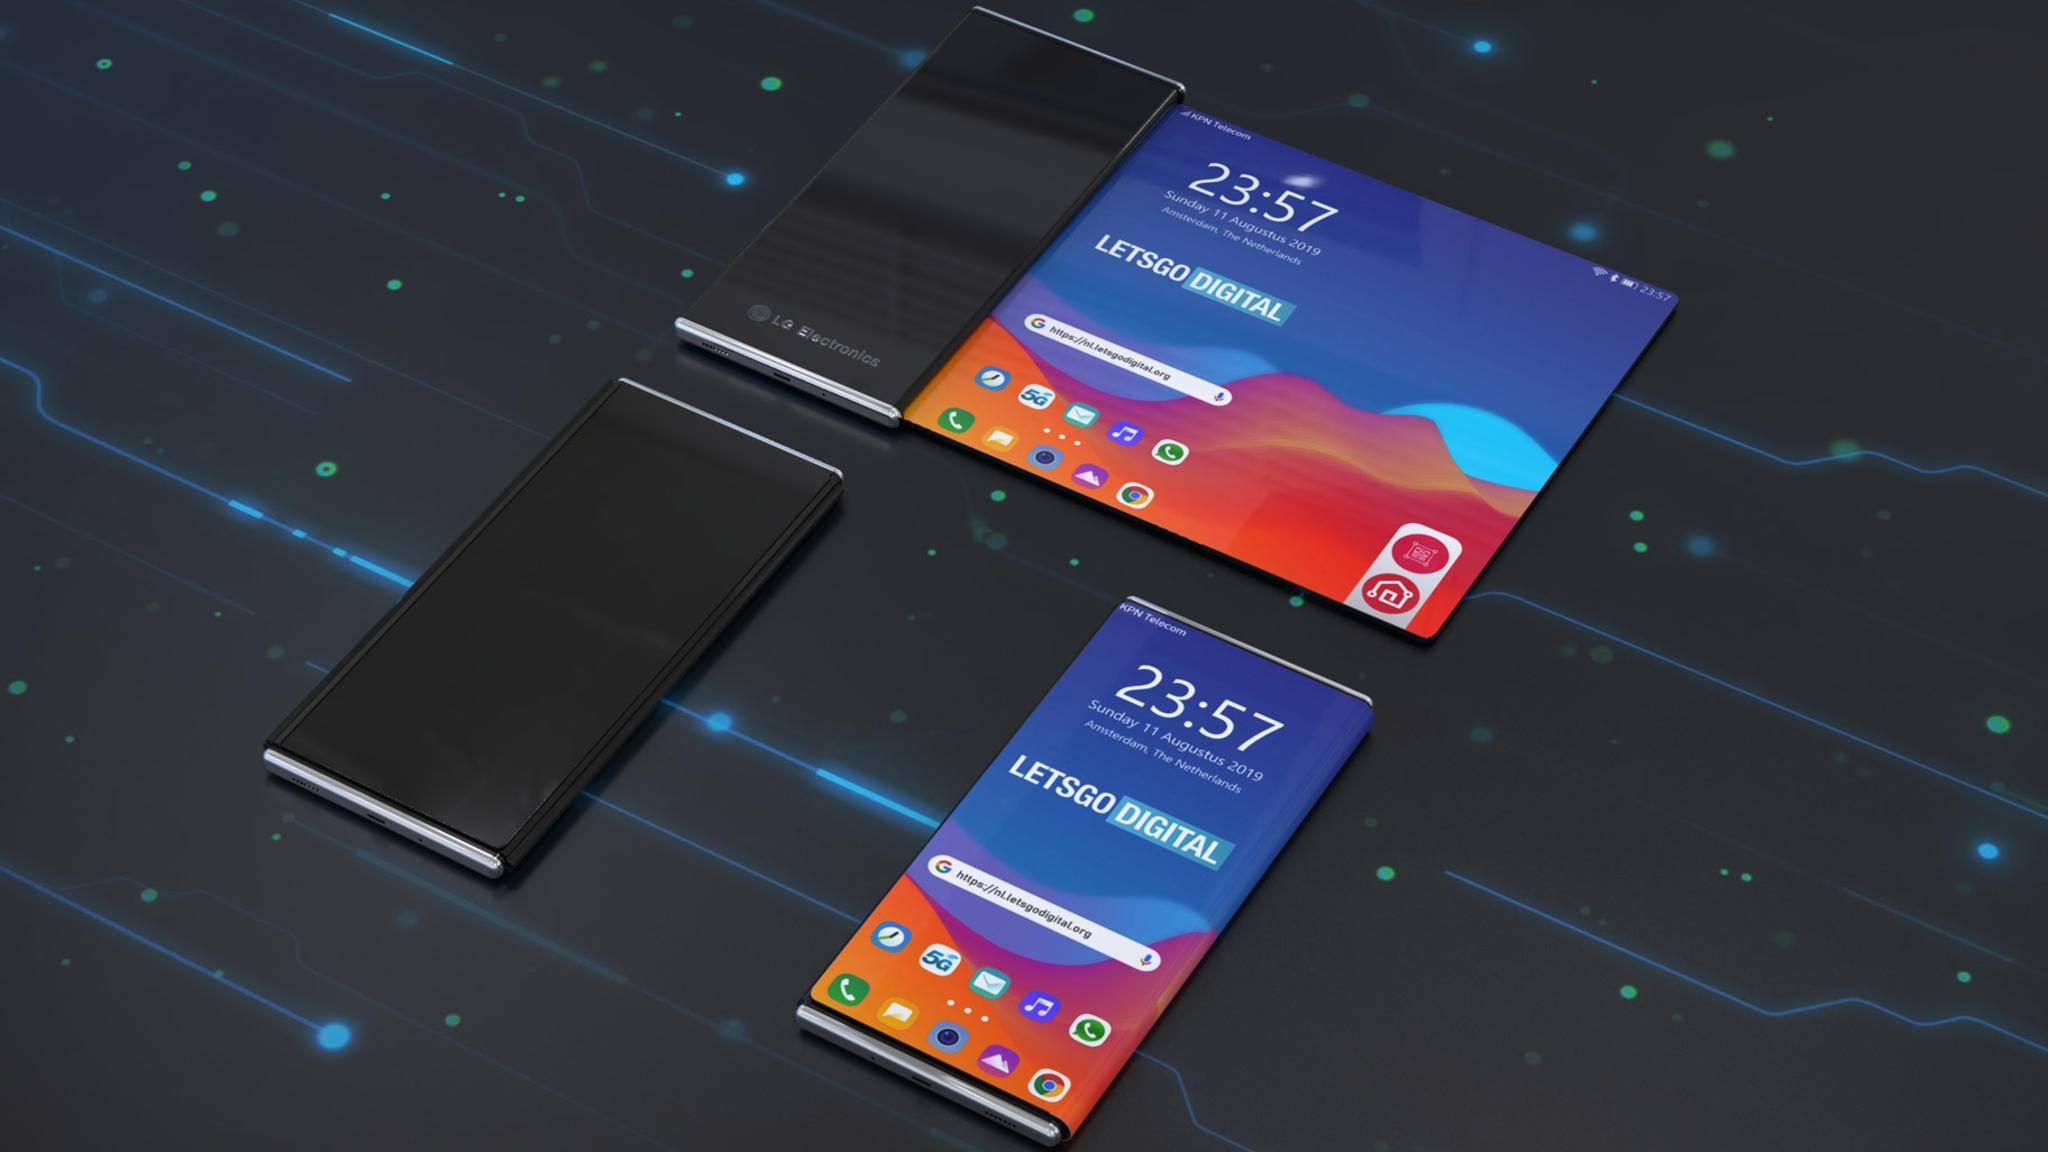 LG rollbares Smartphone